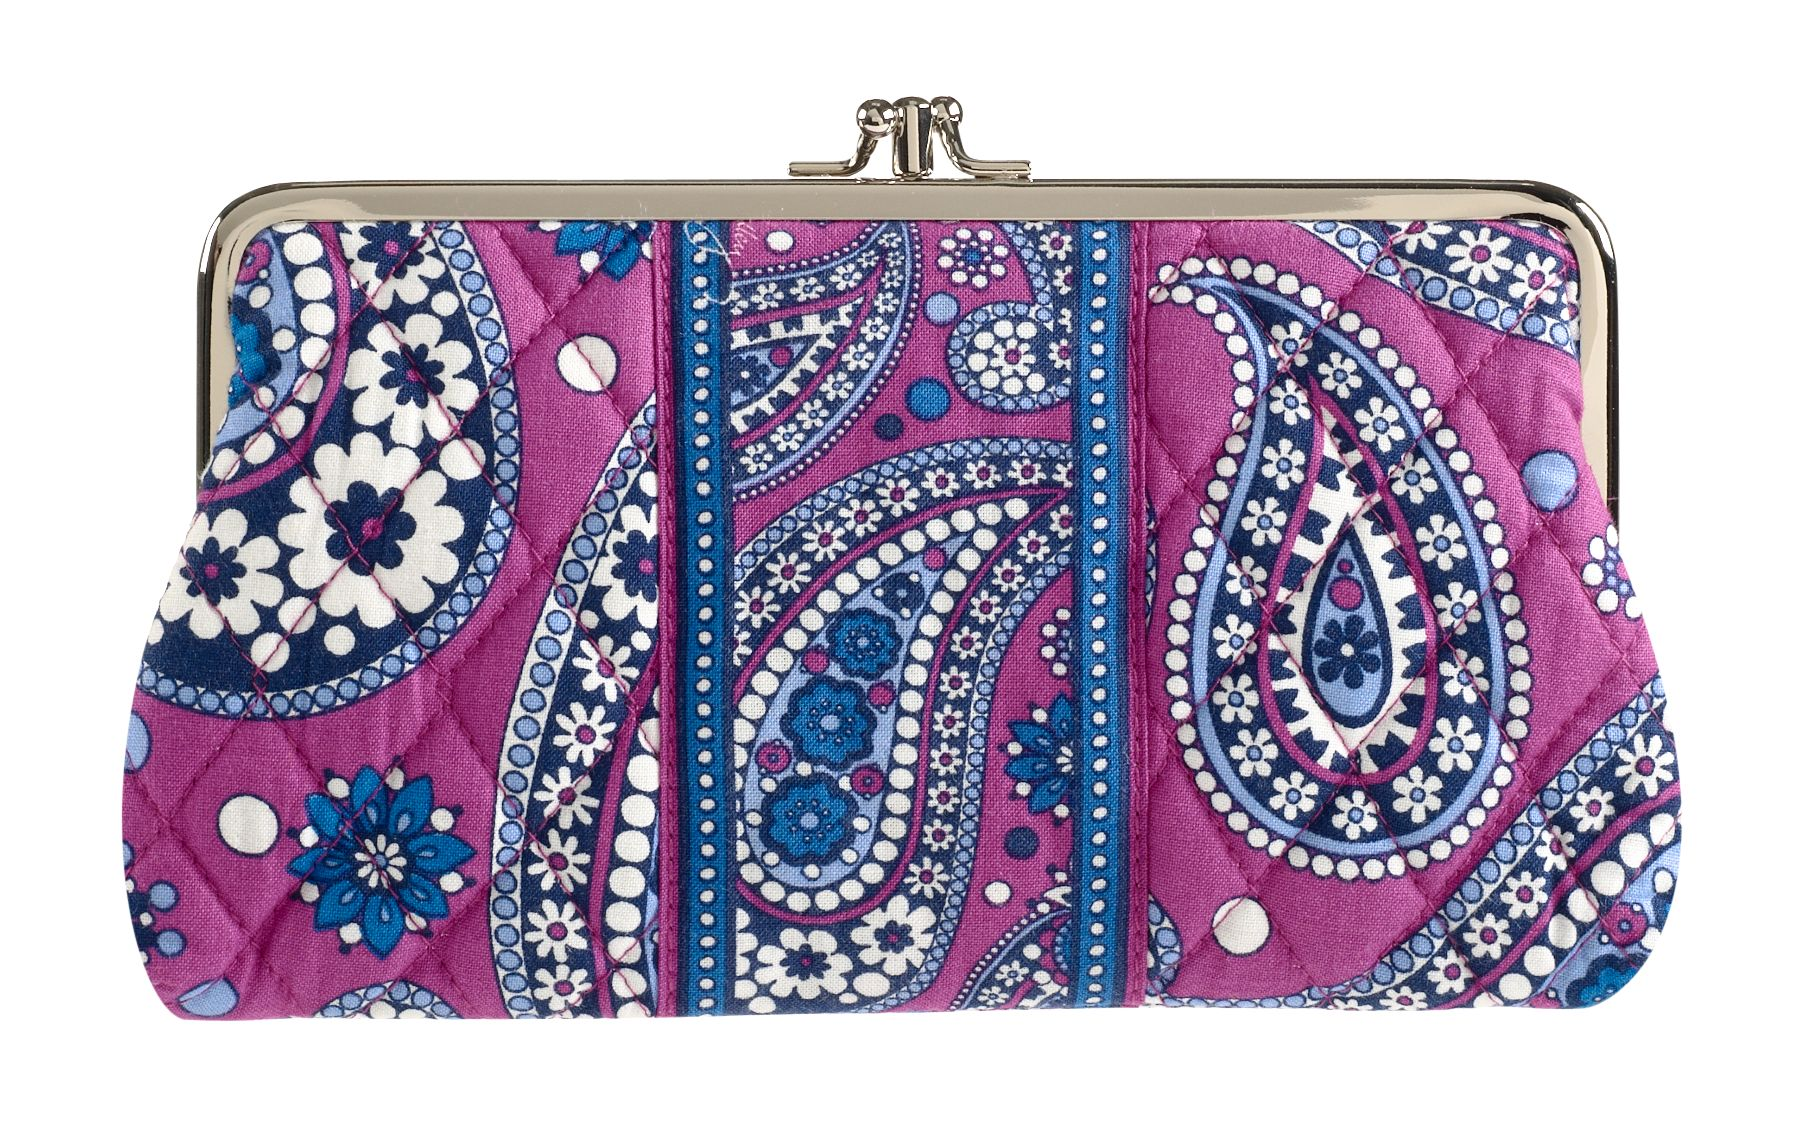 Vera Bradley Travel Duffel Bags